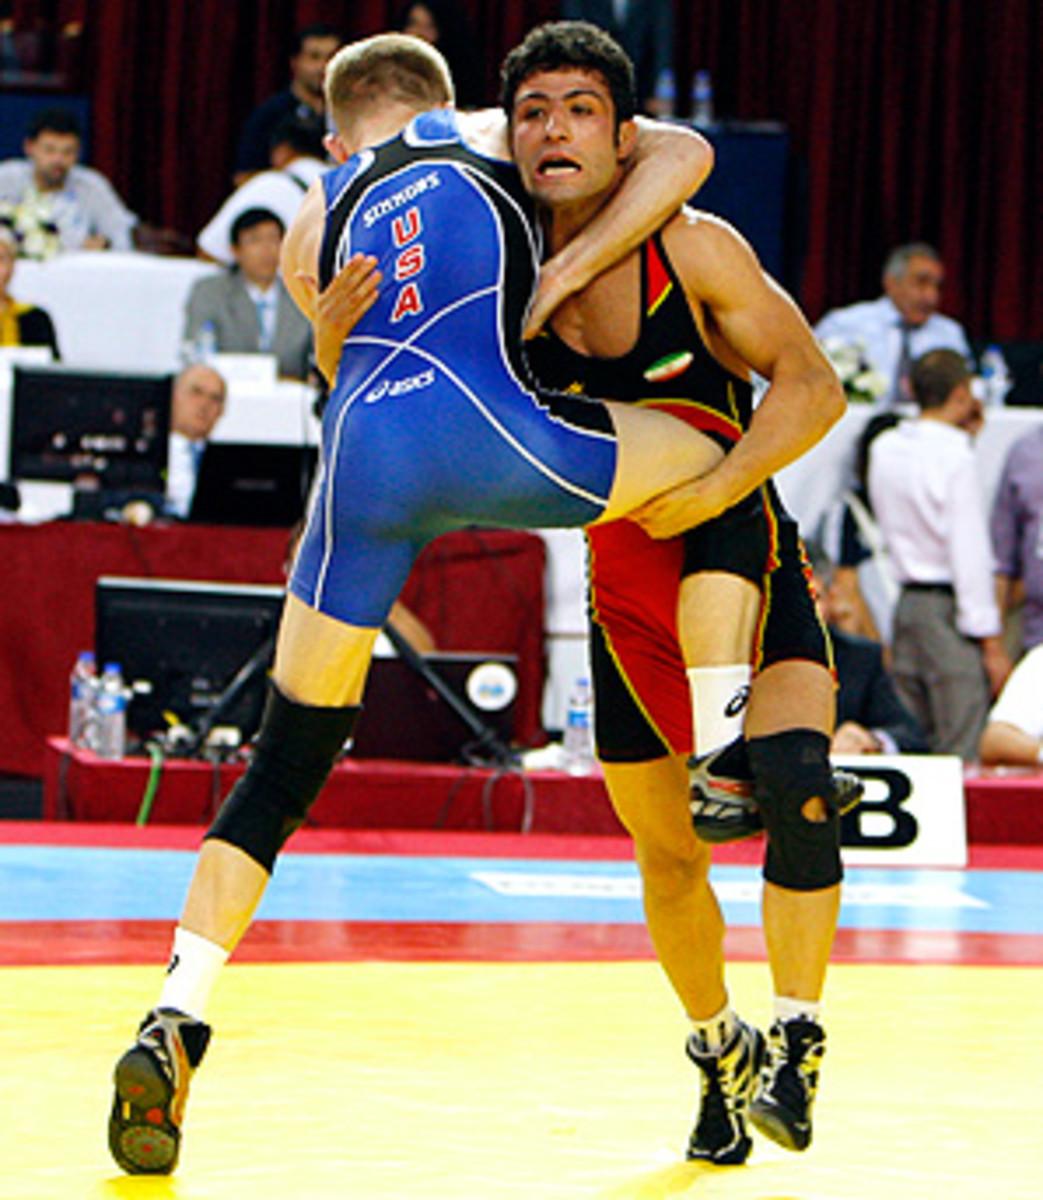 130219110022-us-iran-wrestling-1-single-image-cut.jpg